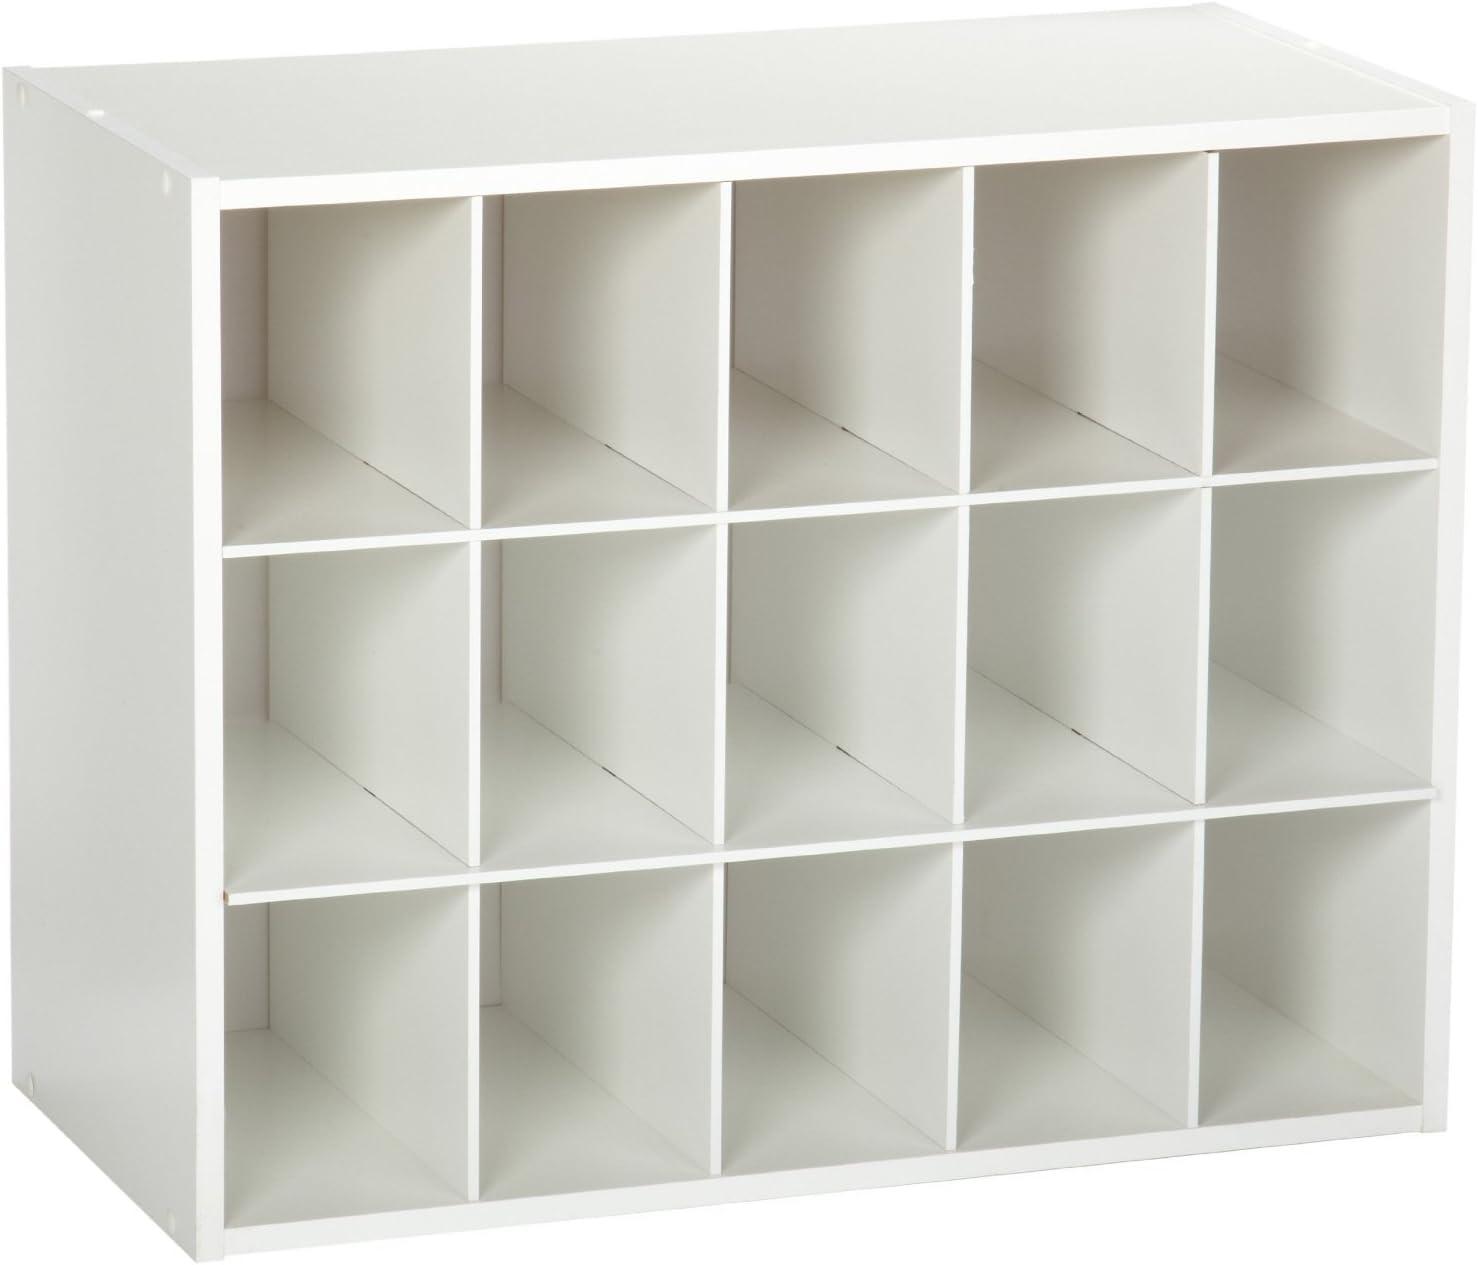 Closetmaid 8983 Stackable 15 Unit Organizer White Home Kitchen